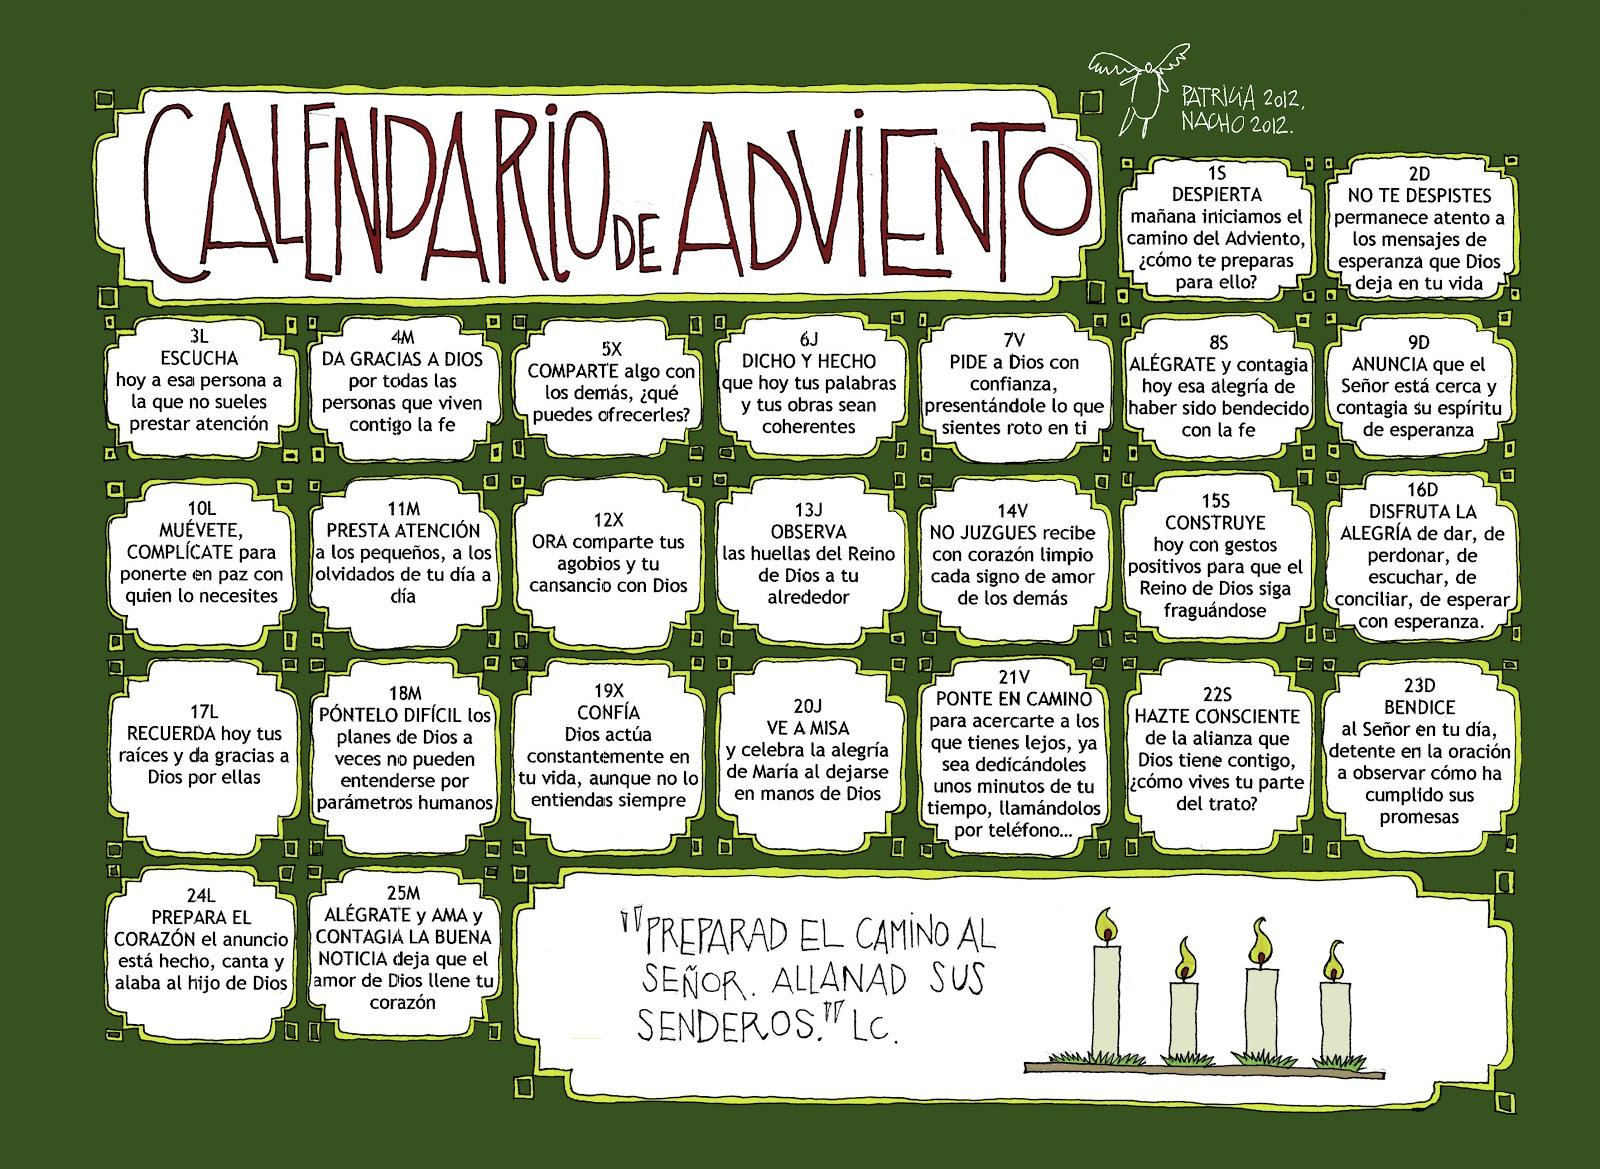 http://odresnuevos.files.wordpress.com/2012/11/calendario-adviento-2012-patricia-rojo.jpg